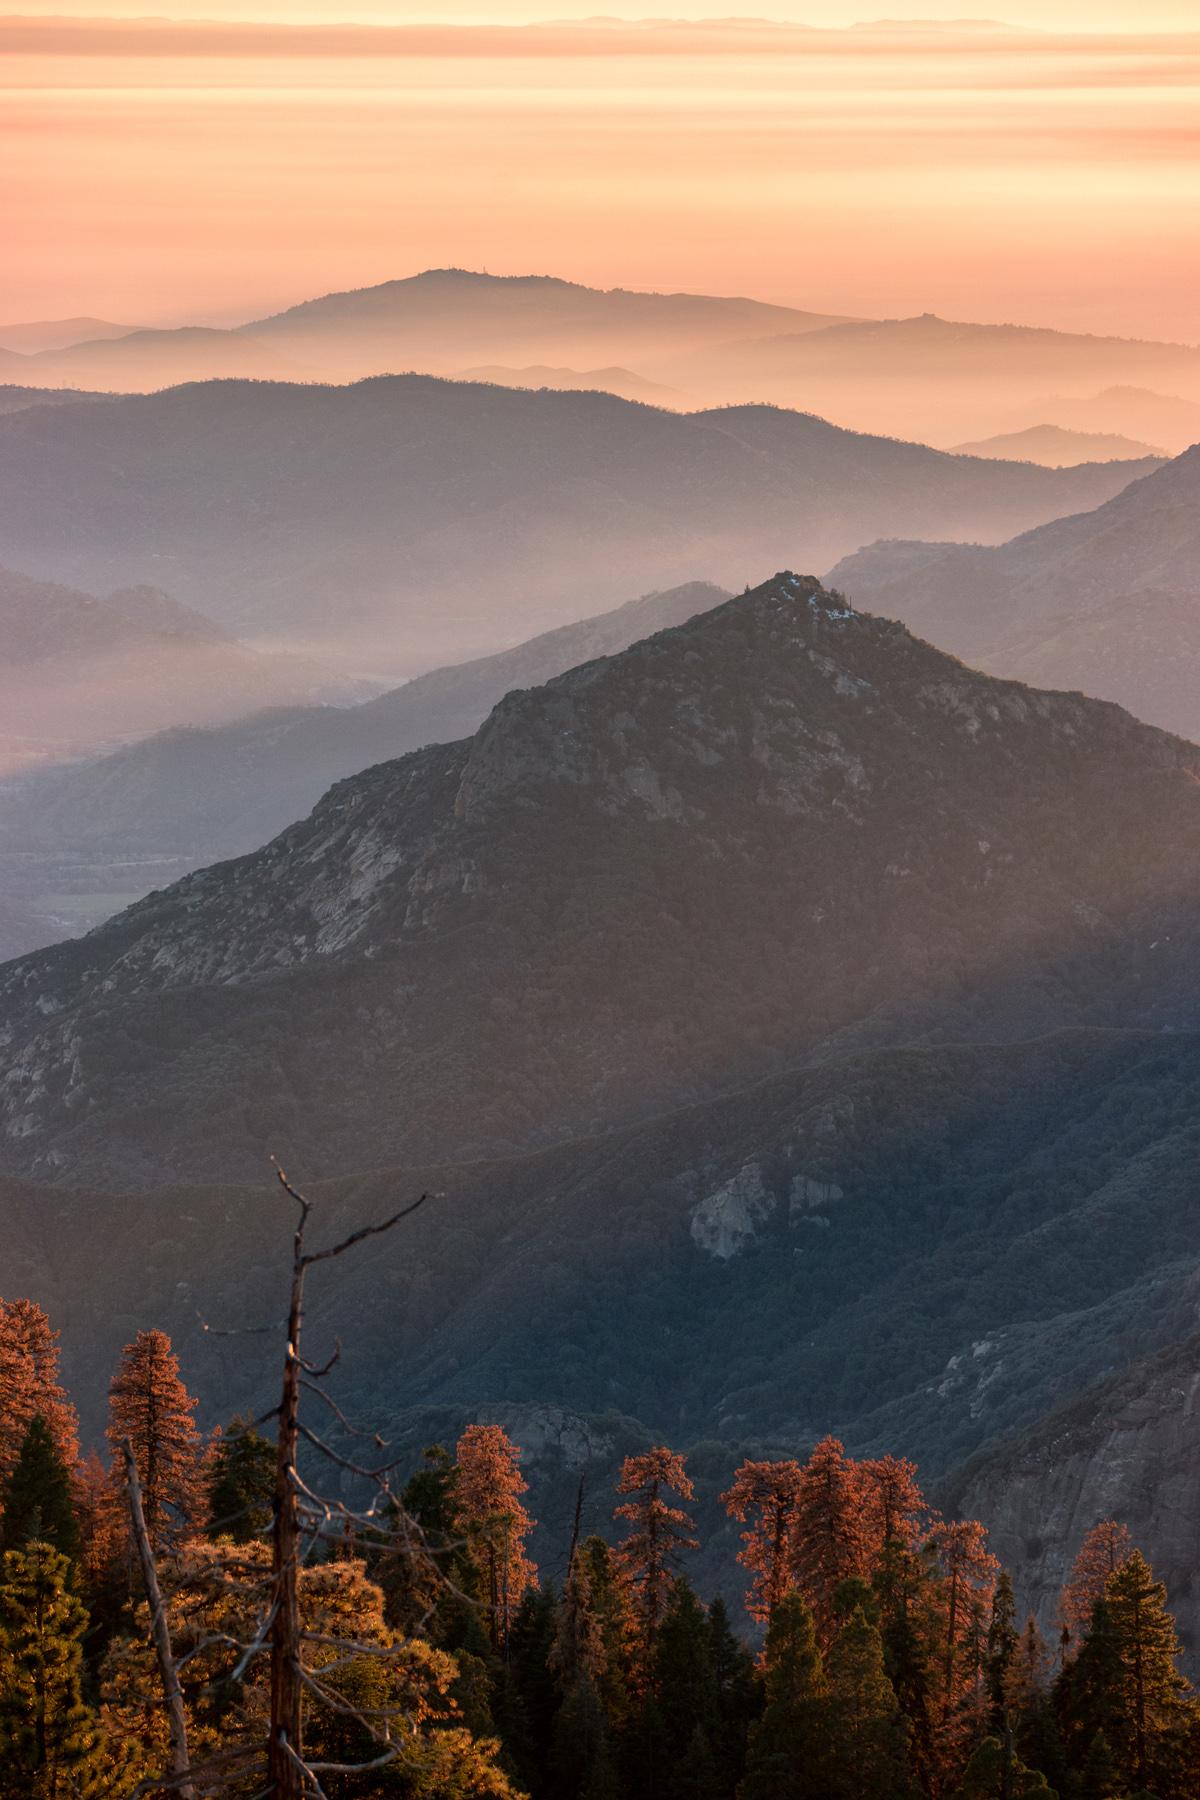 Wasim Muklashy Photography_Sequoia National Park_California_December 2015_-SAM_4168-Edit.jpg